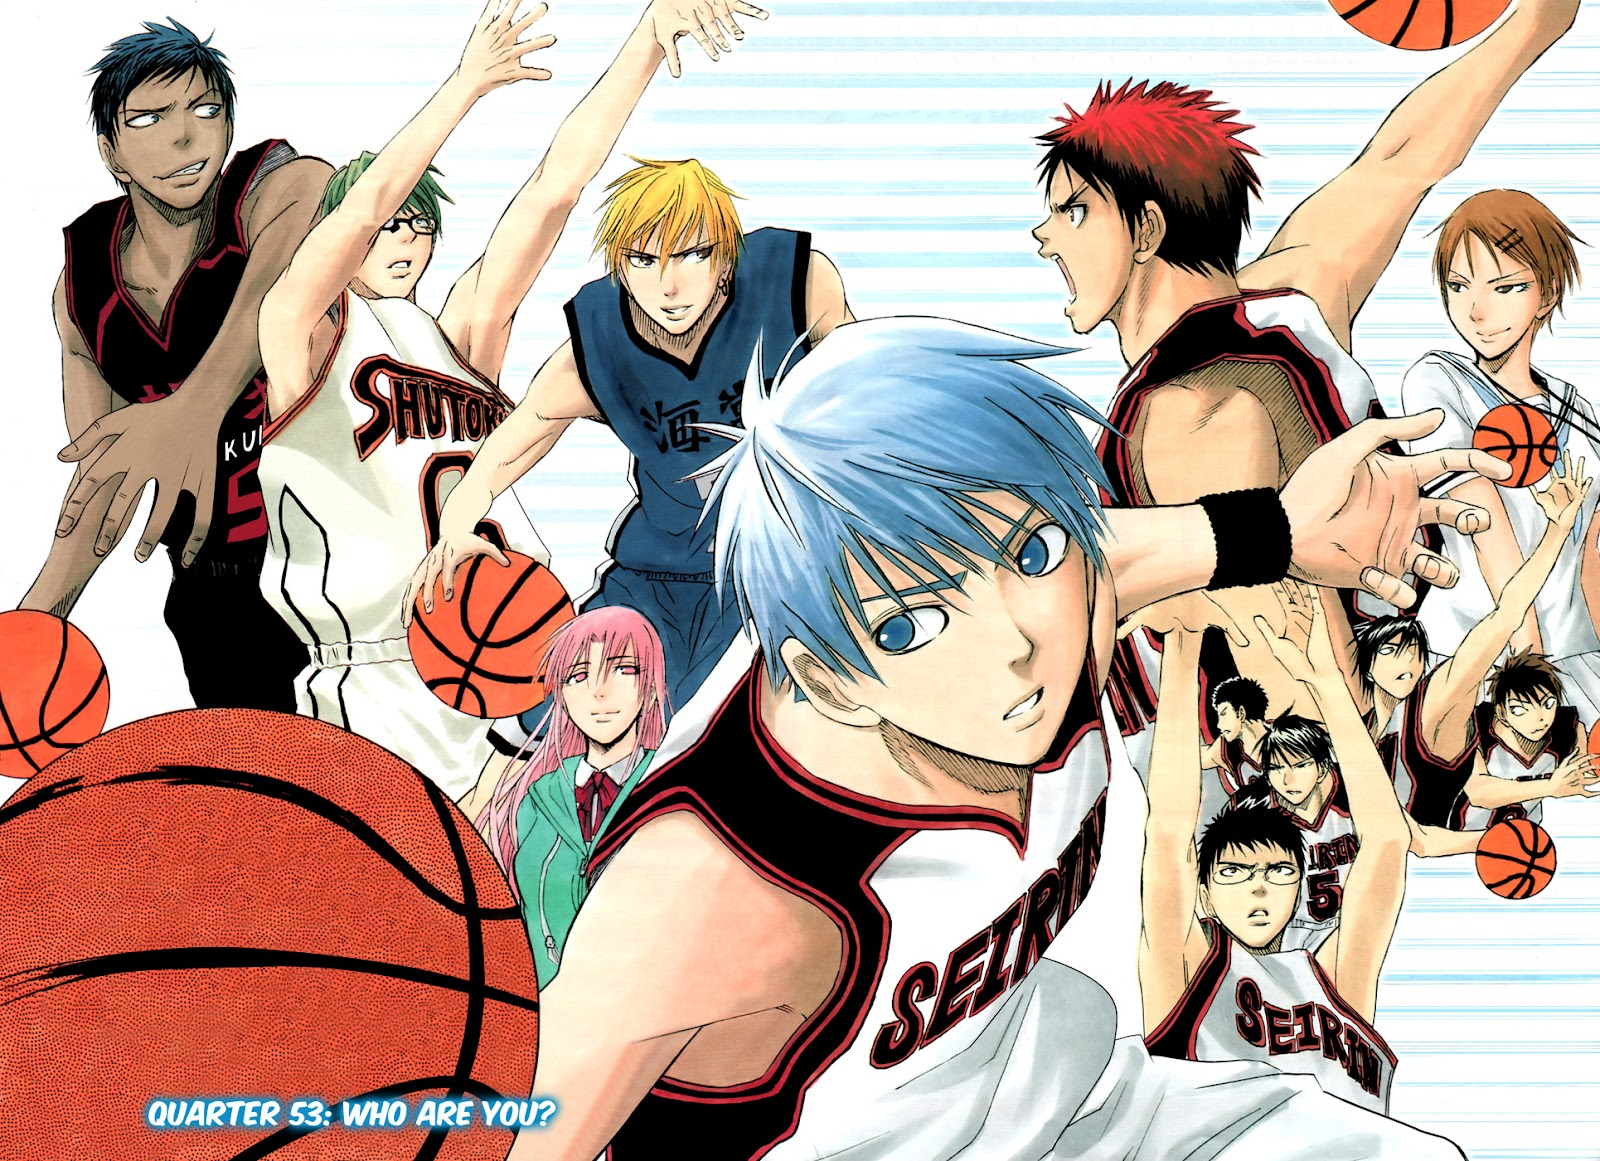 Kuroko no Basket Manga Chapter 53 - Image 8-009